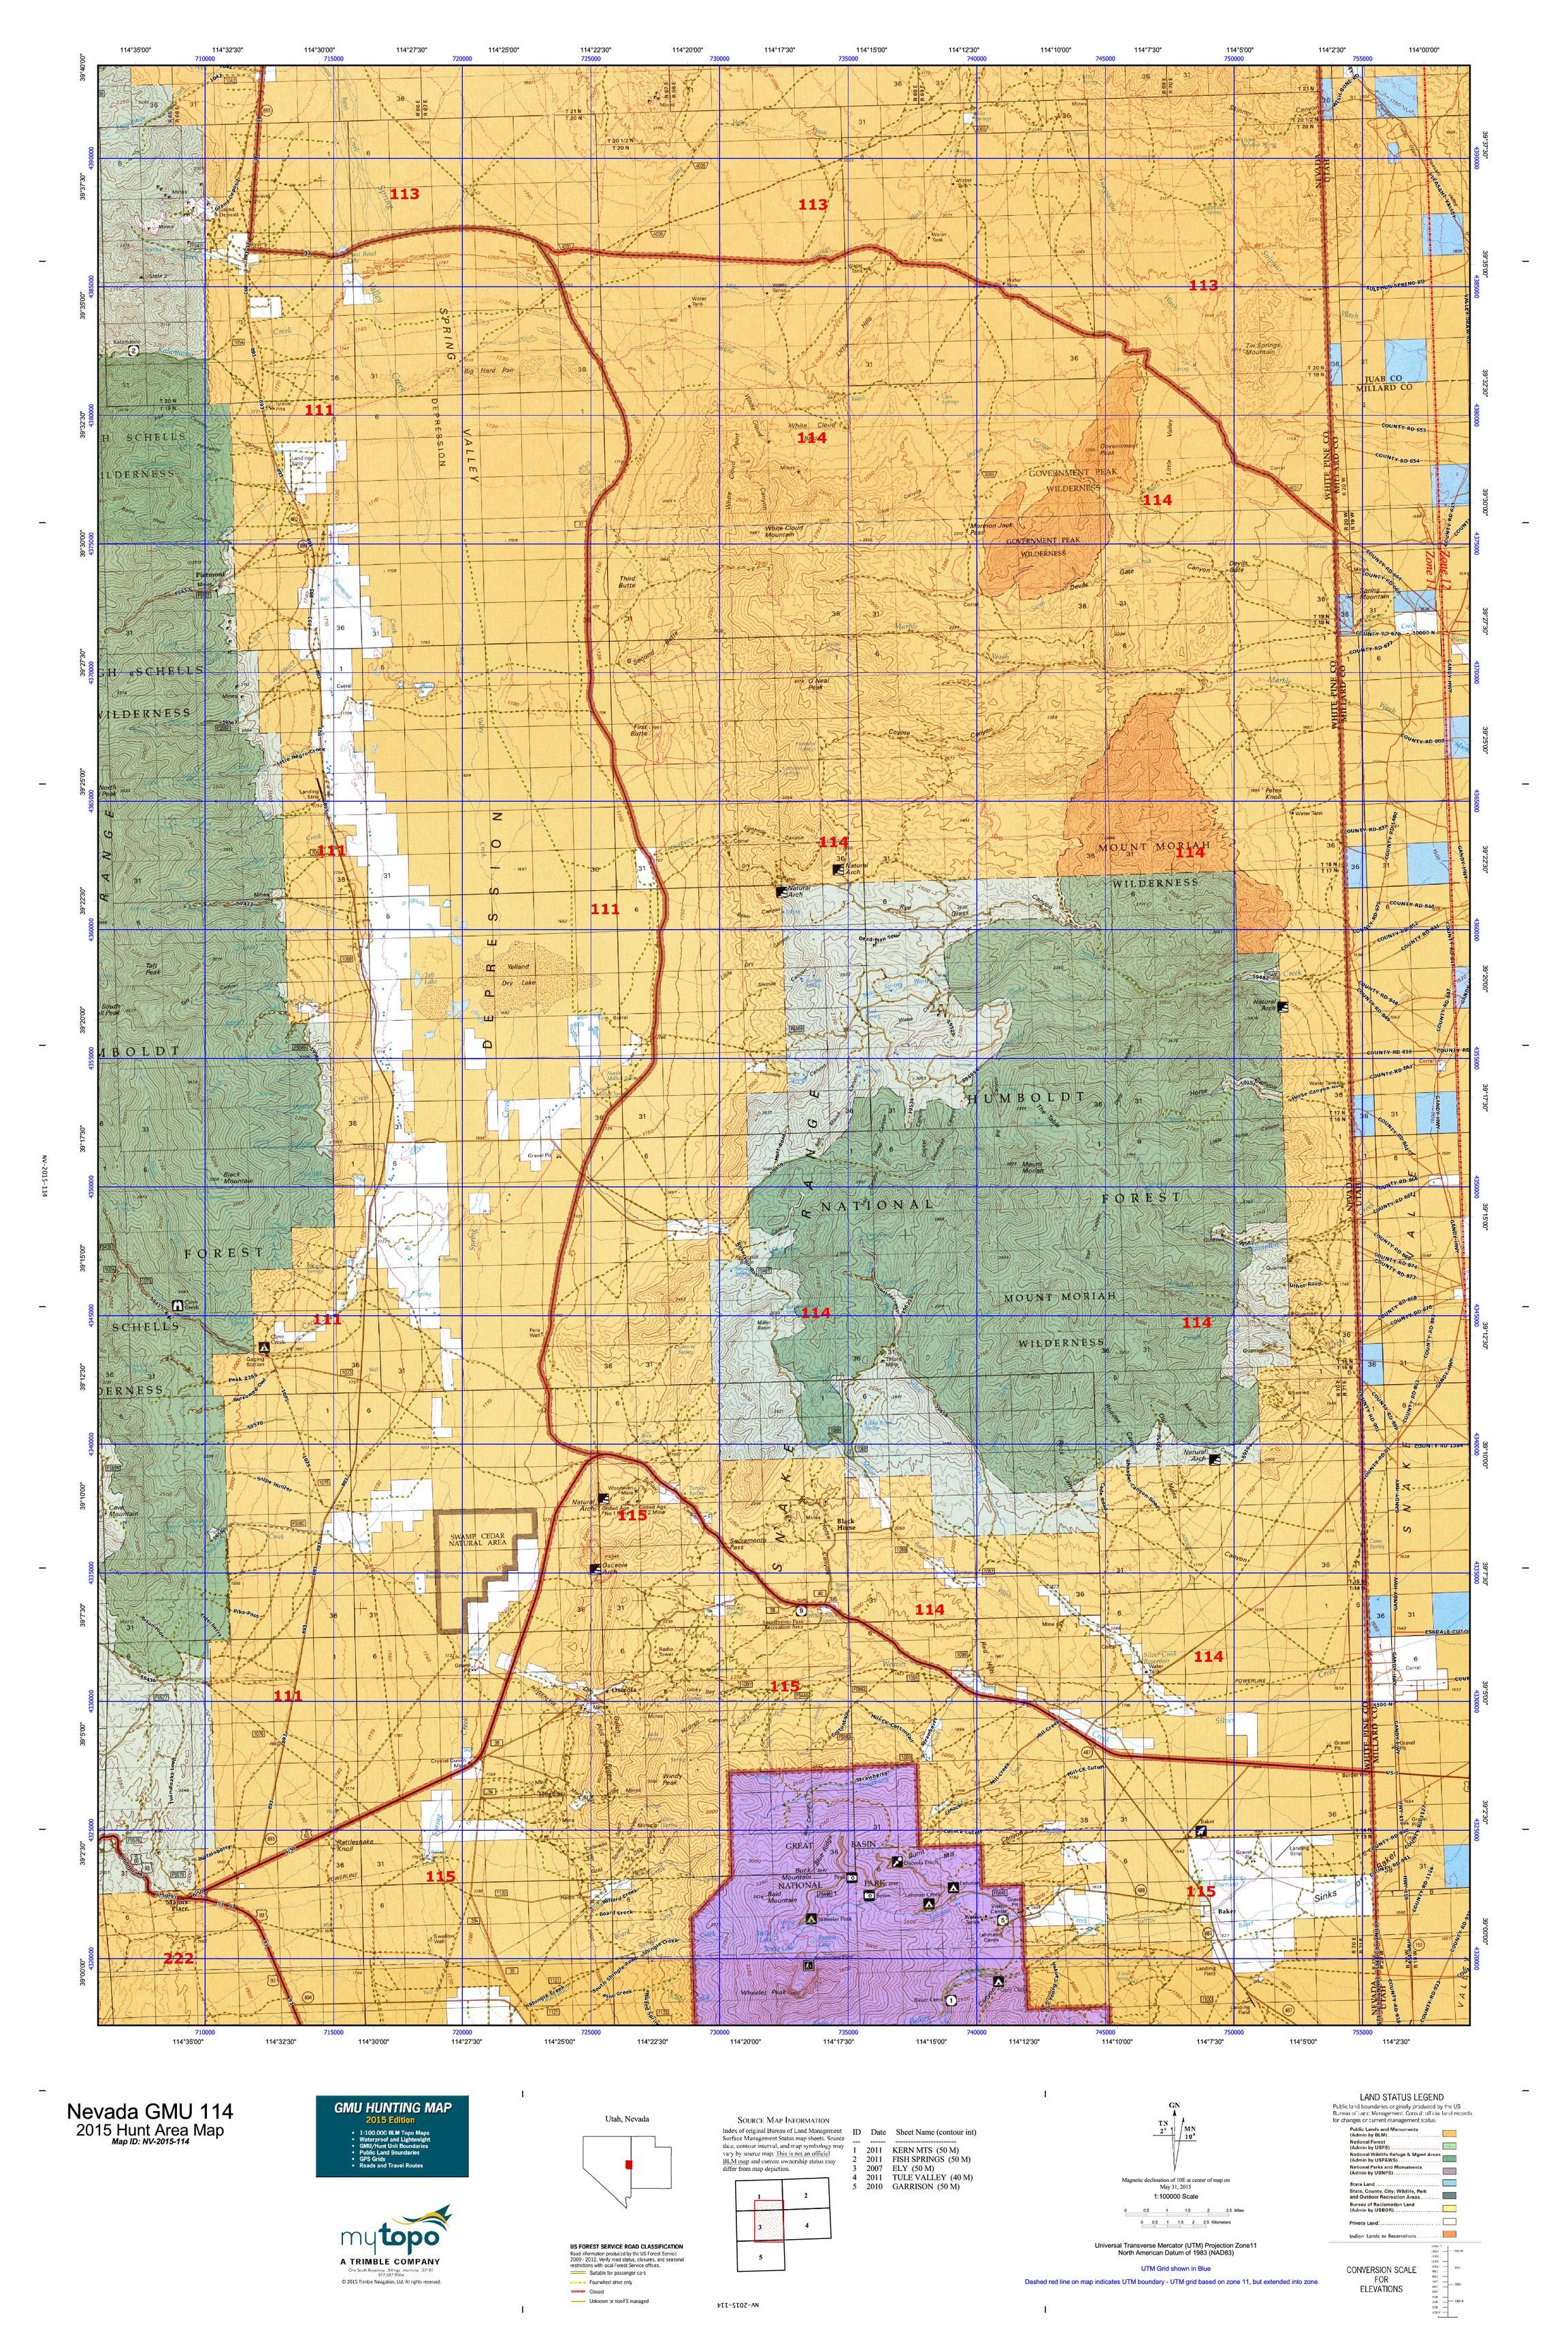 Nevada GMU 114 Map  MyTopo